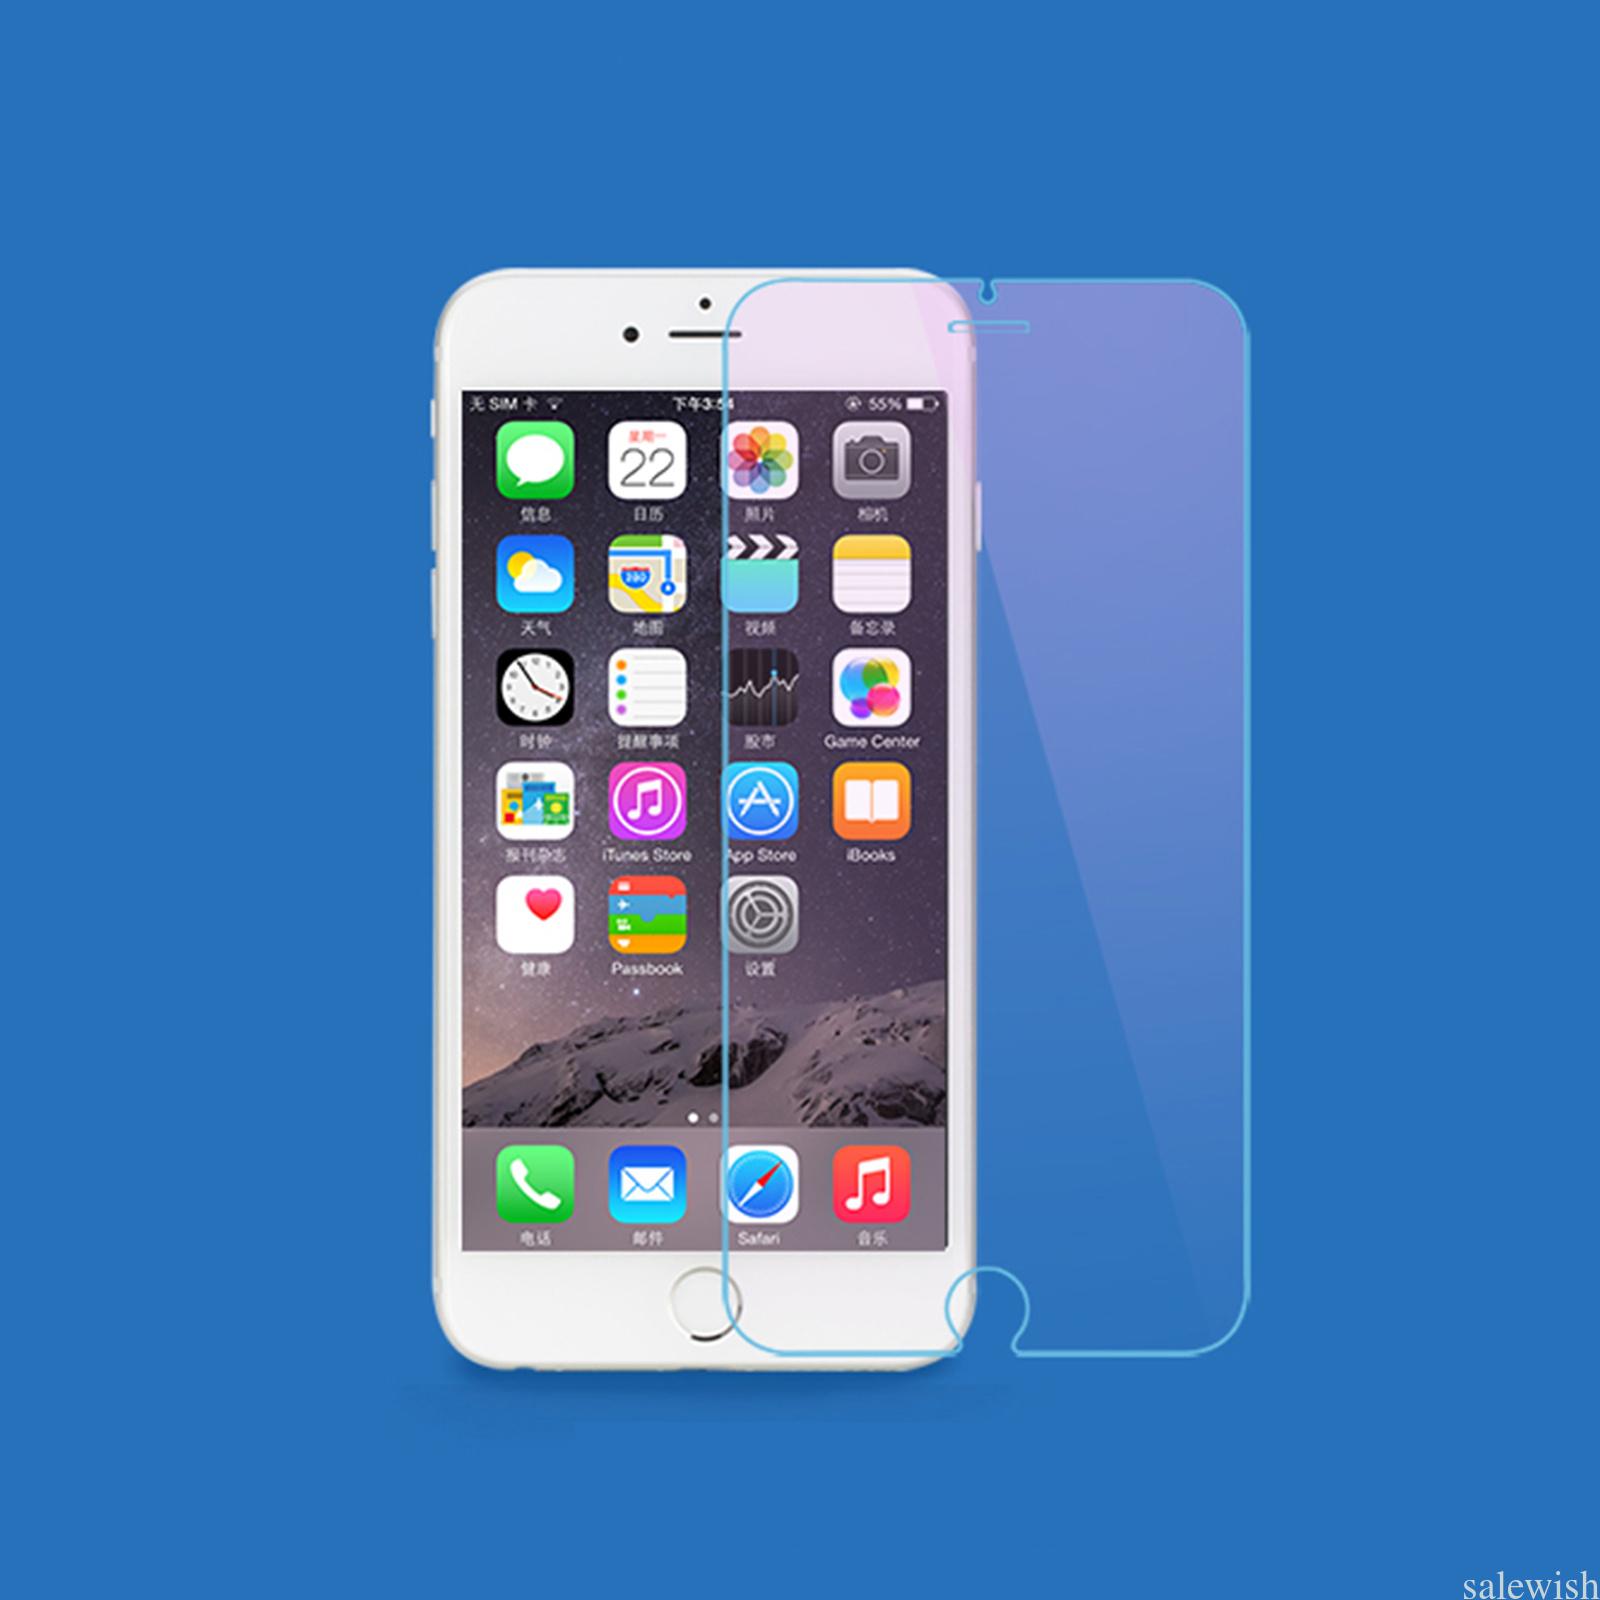 Protector-Cristal-Templado-Silk-para-iPhone-6-6S-7-Plus-9H-Transparente-New miniatura 11